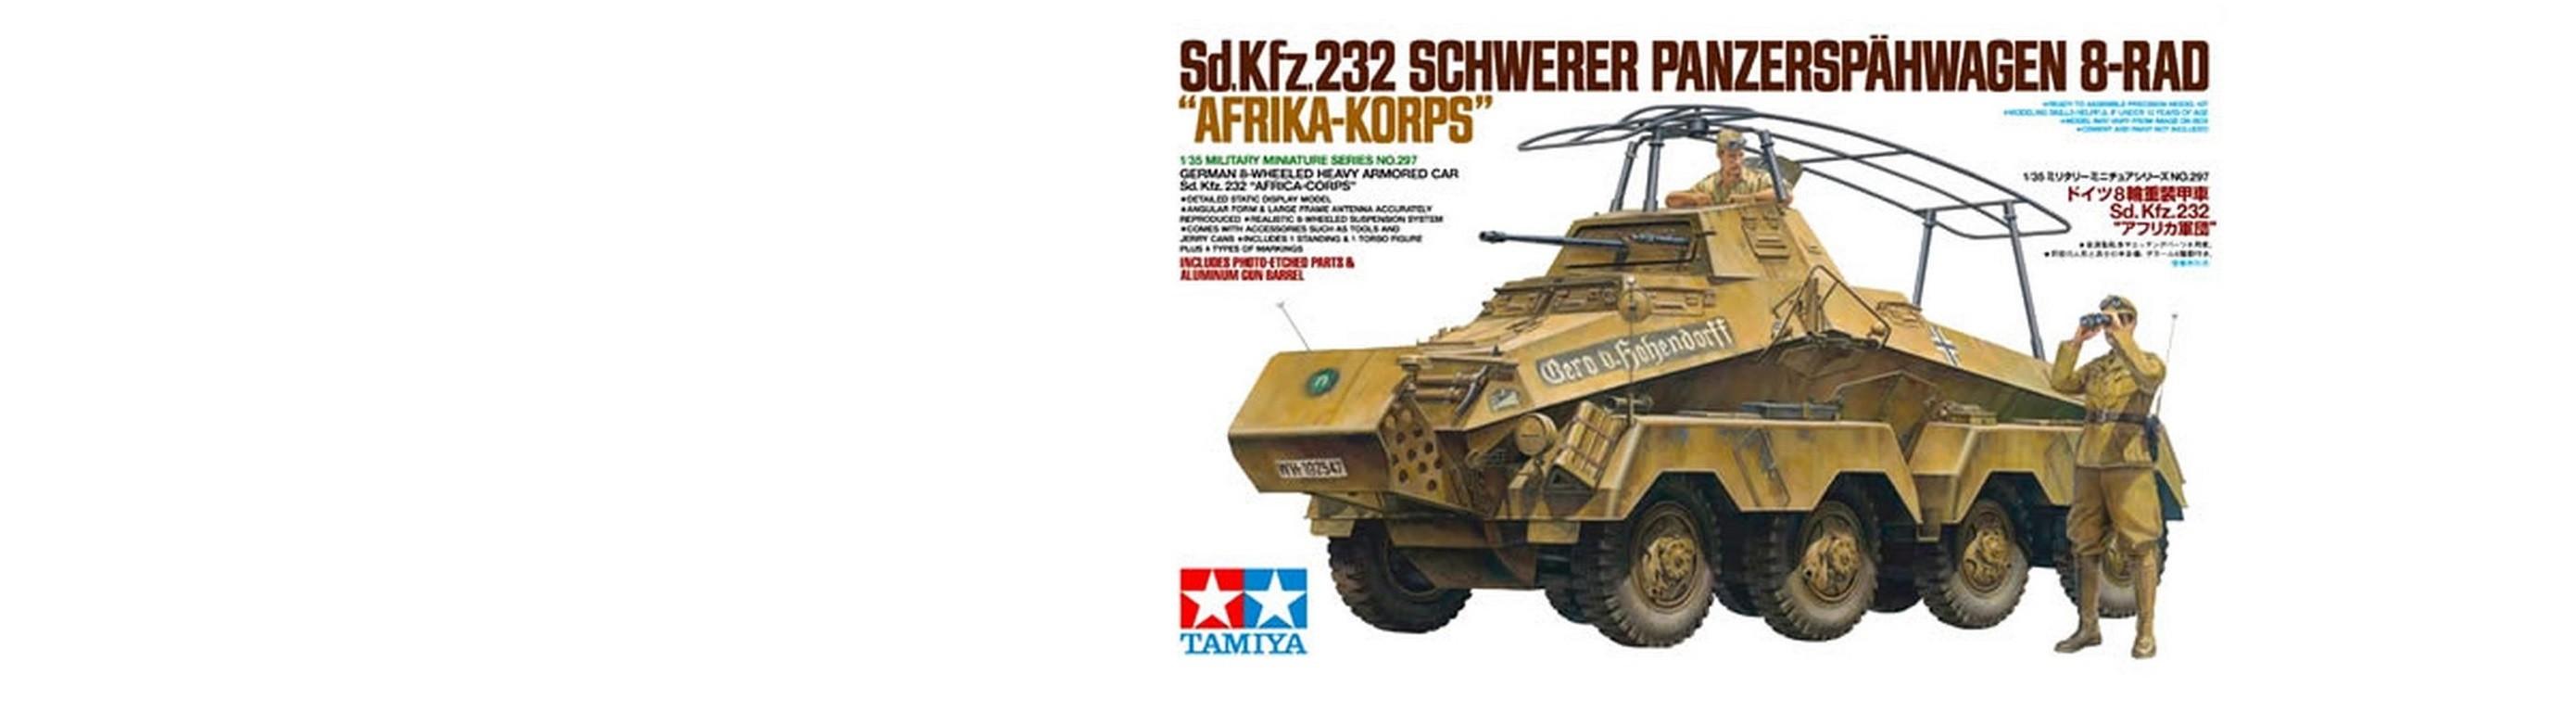 Sd.Kfz.232 Afrika Korps